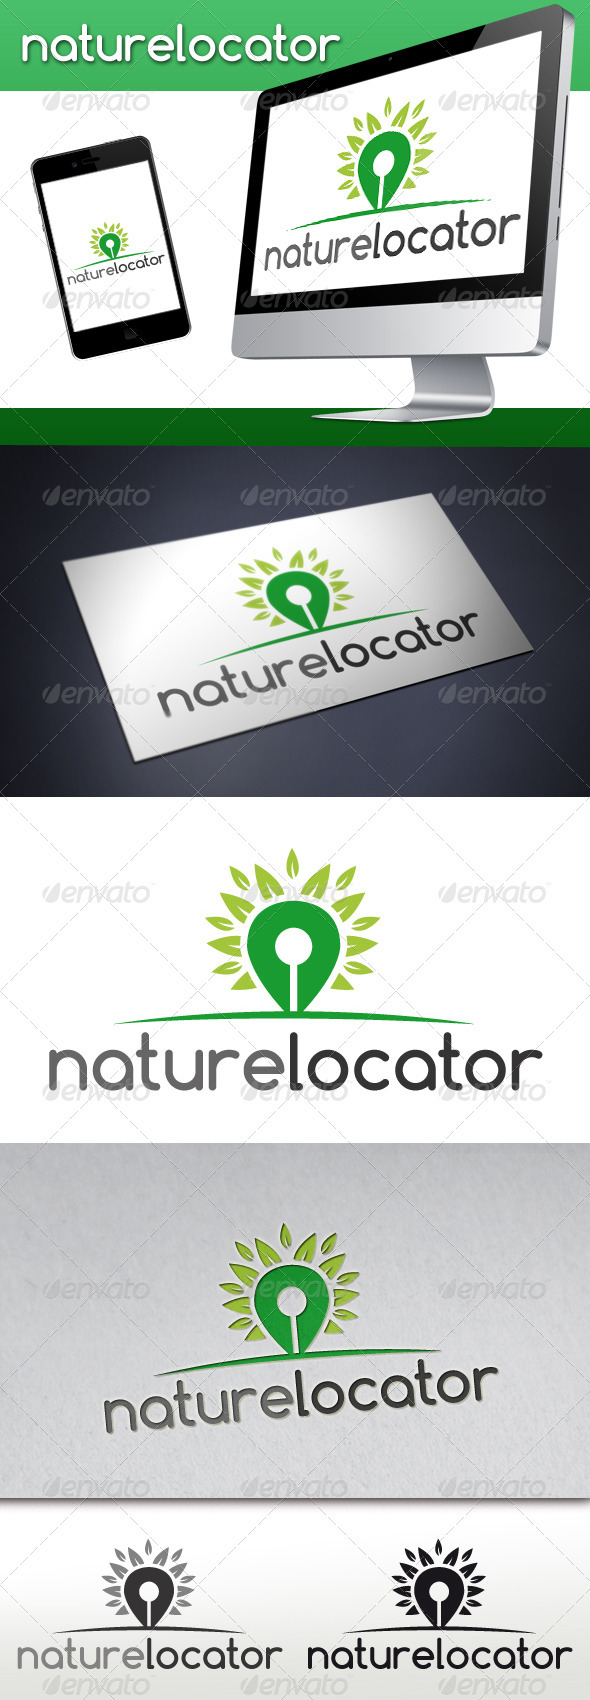 GraphicRiver Nature Locator Logo 3533977